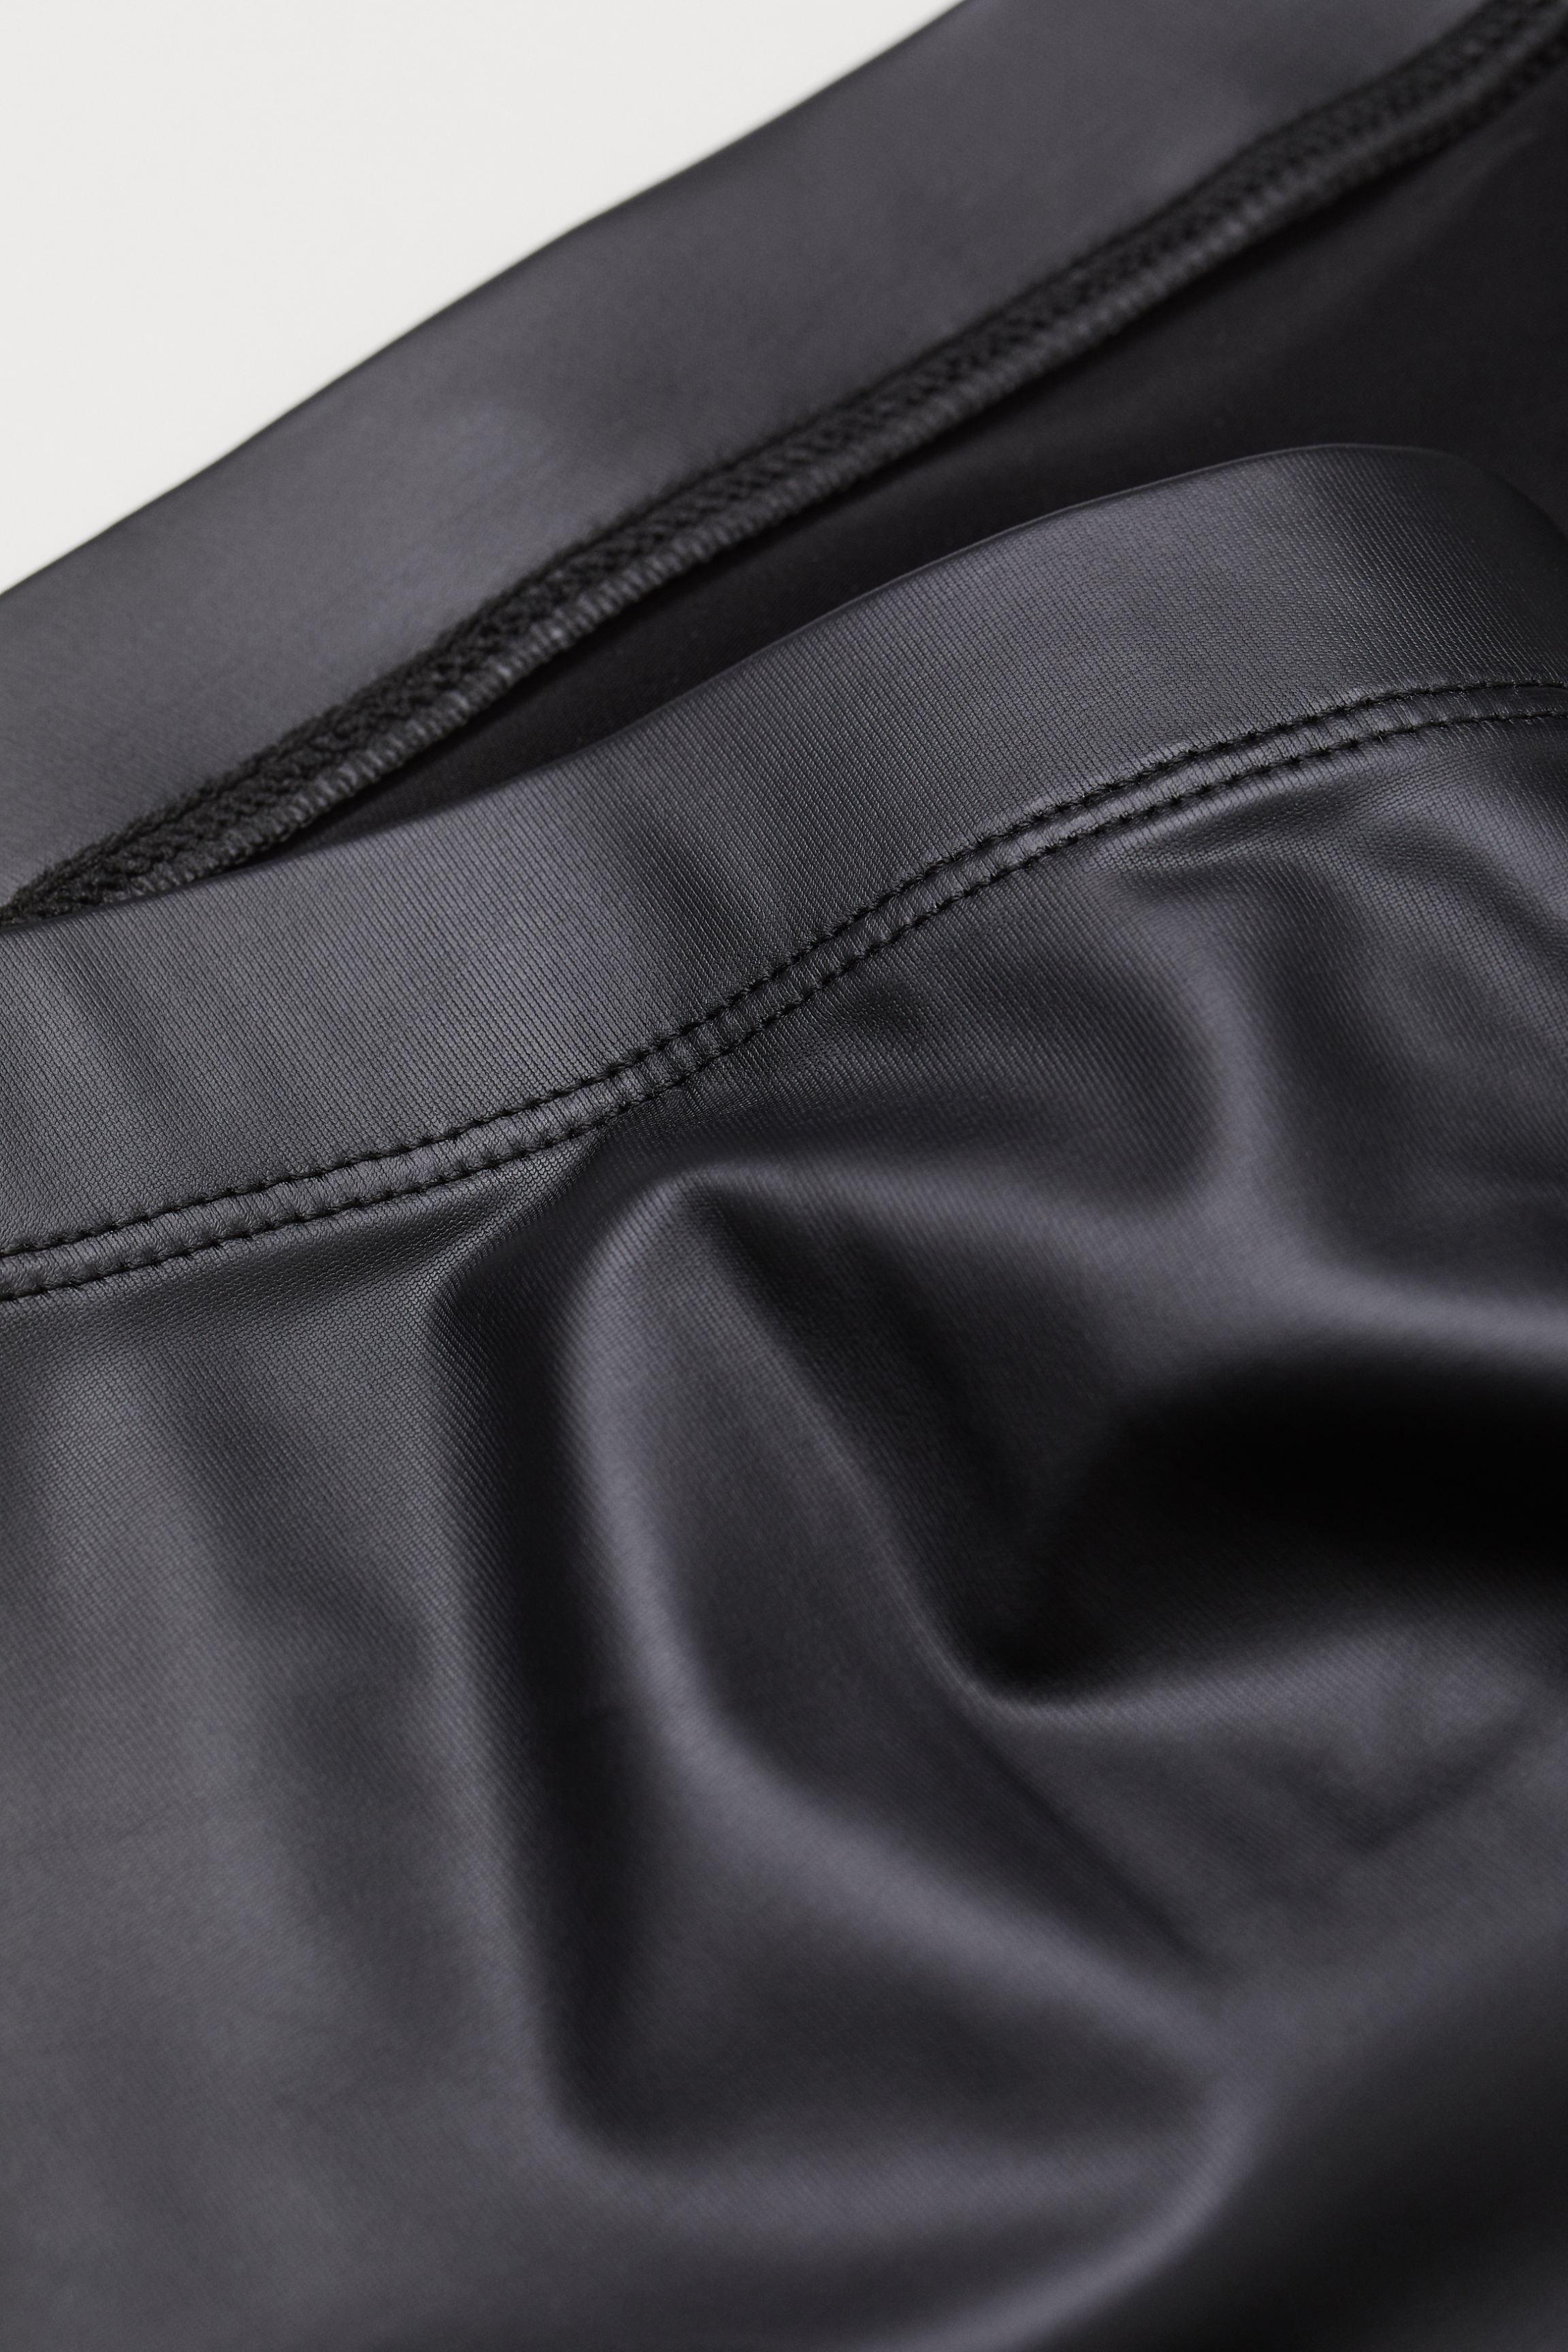 H&M+ Faux Leather Leggings